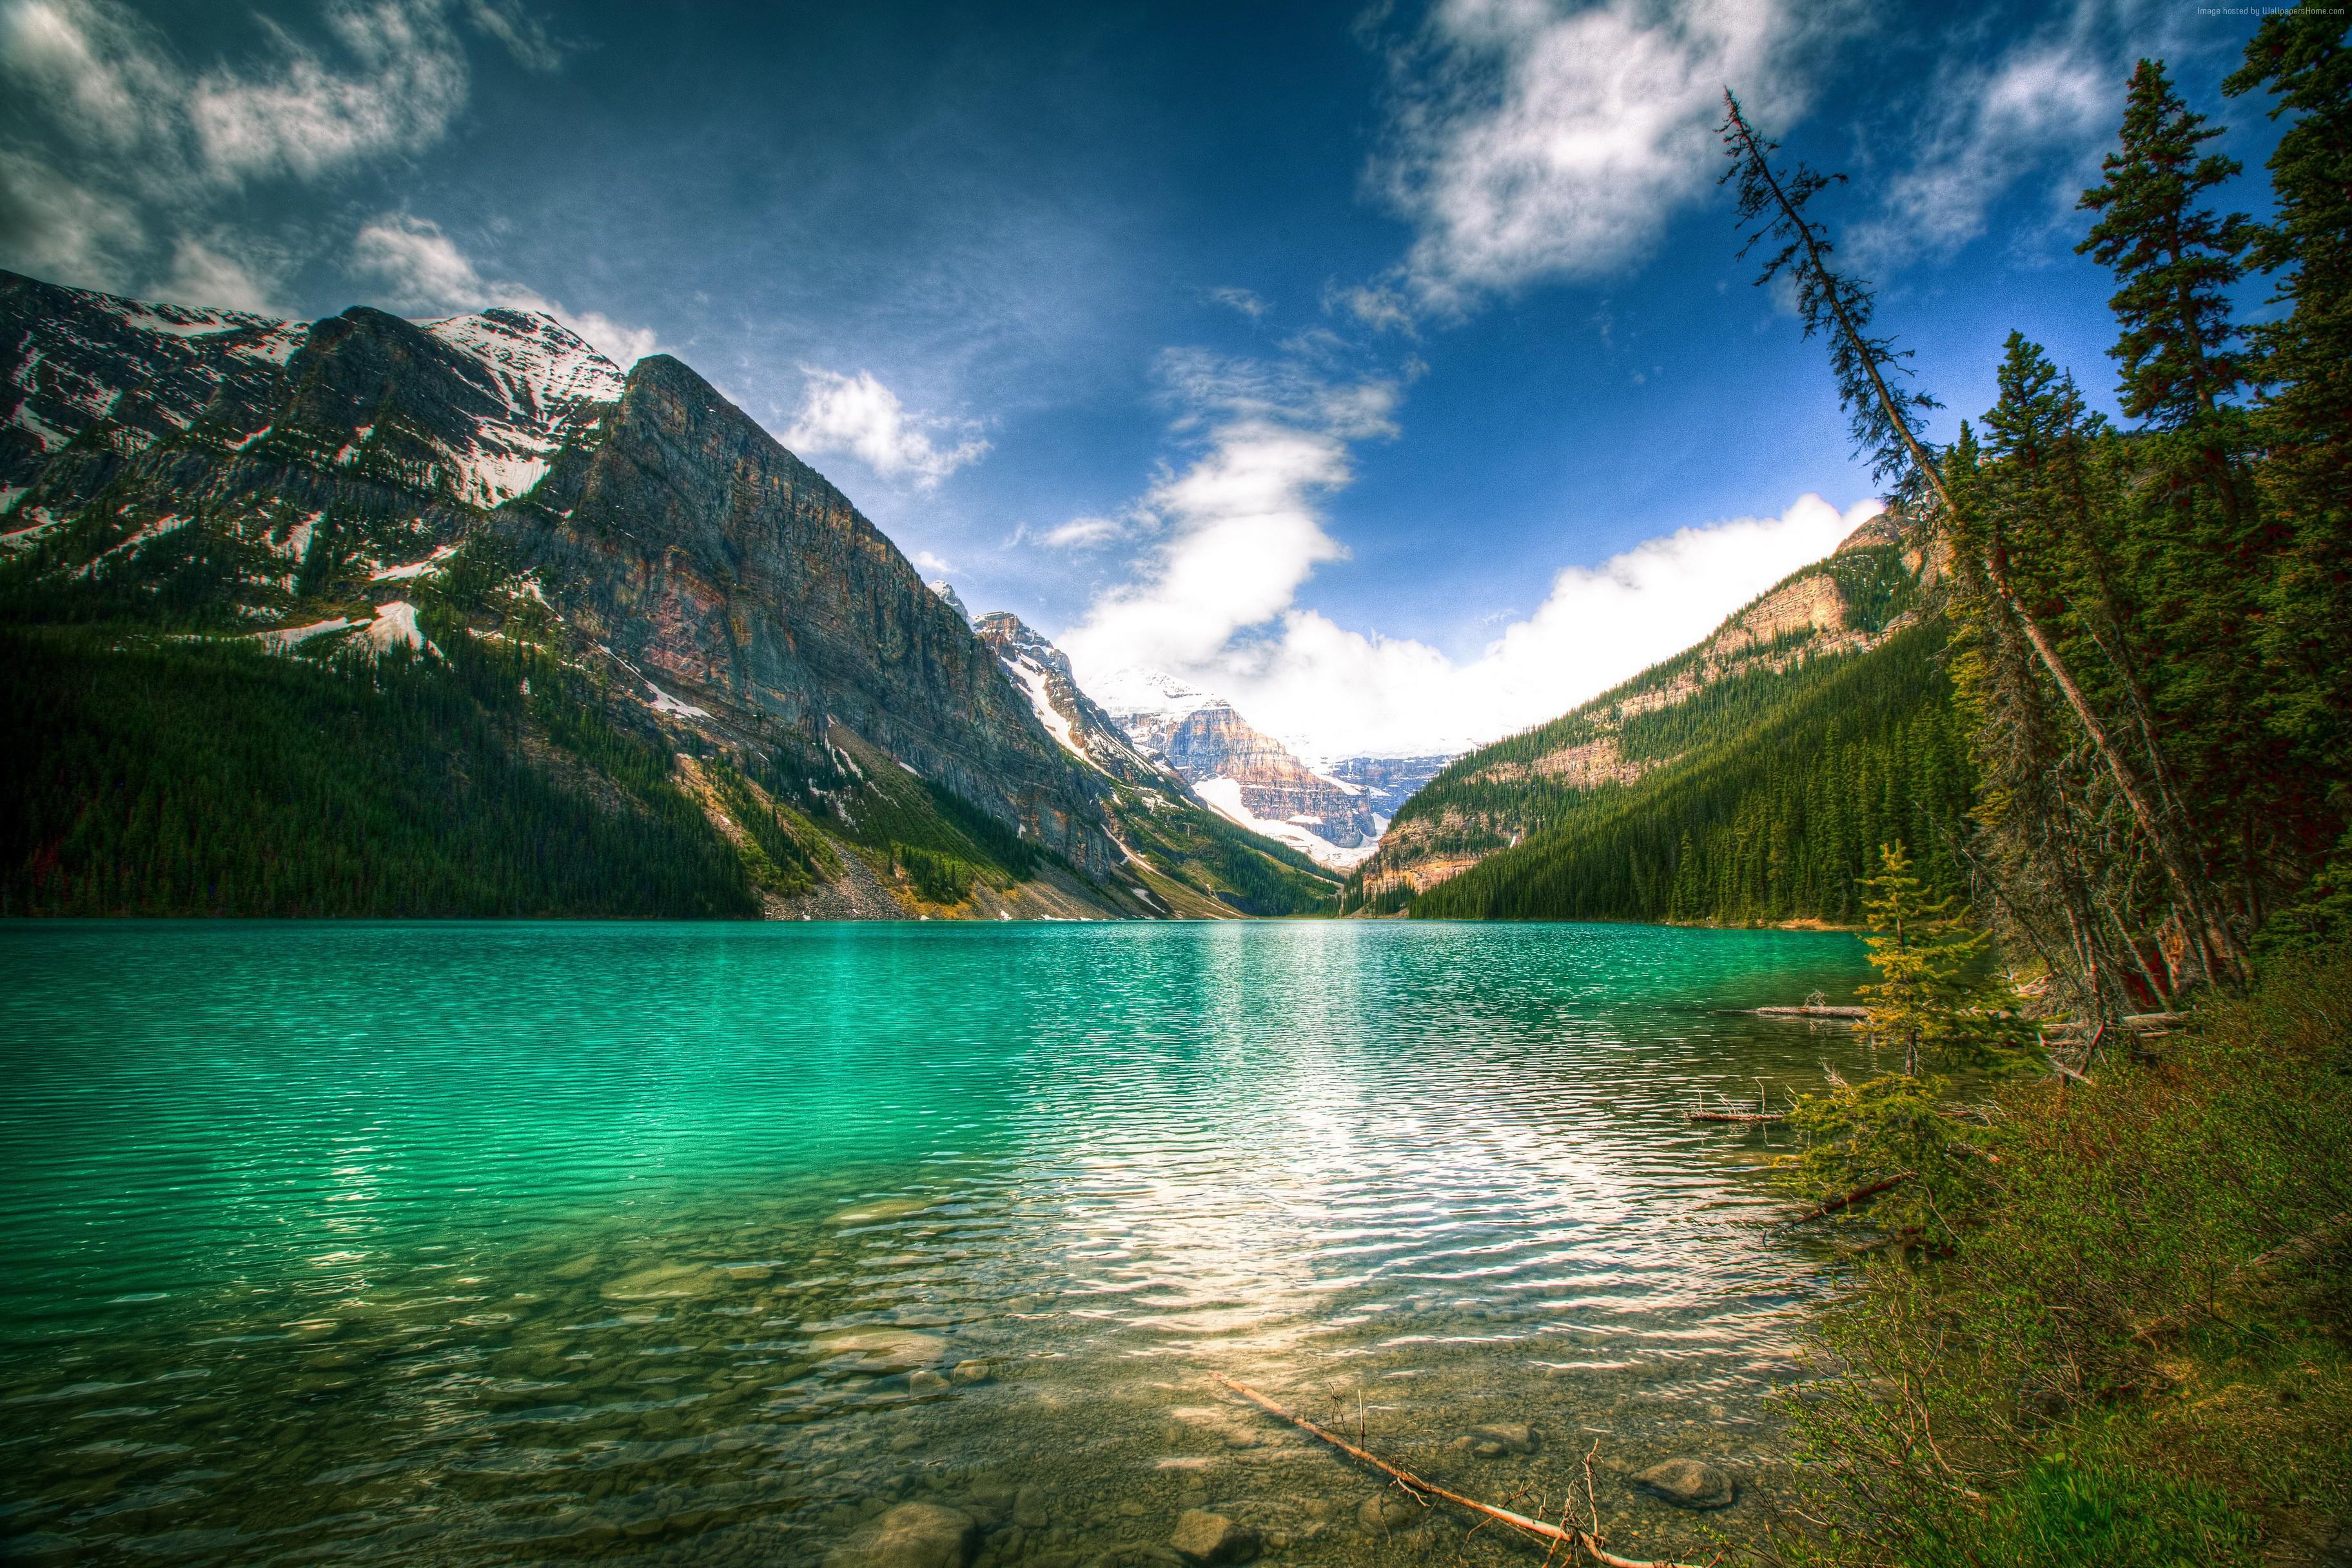 129360 4K Banff National Park Lake Louise Nature wallpapers 3648x2432